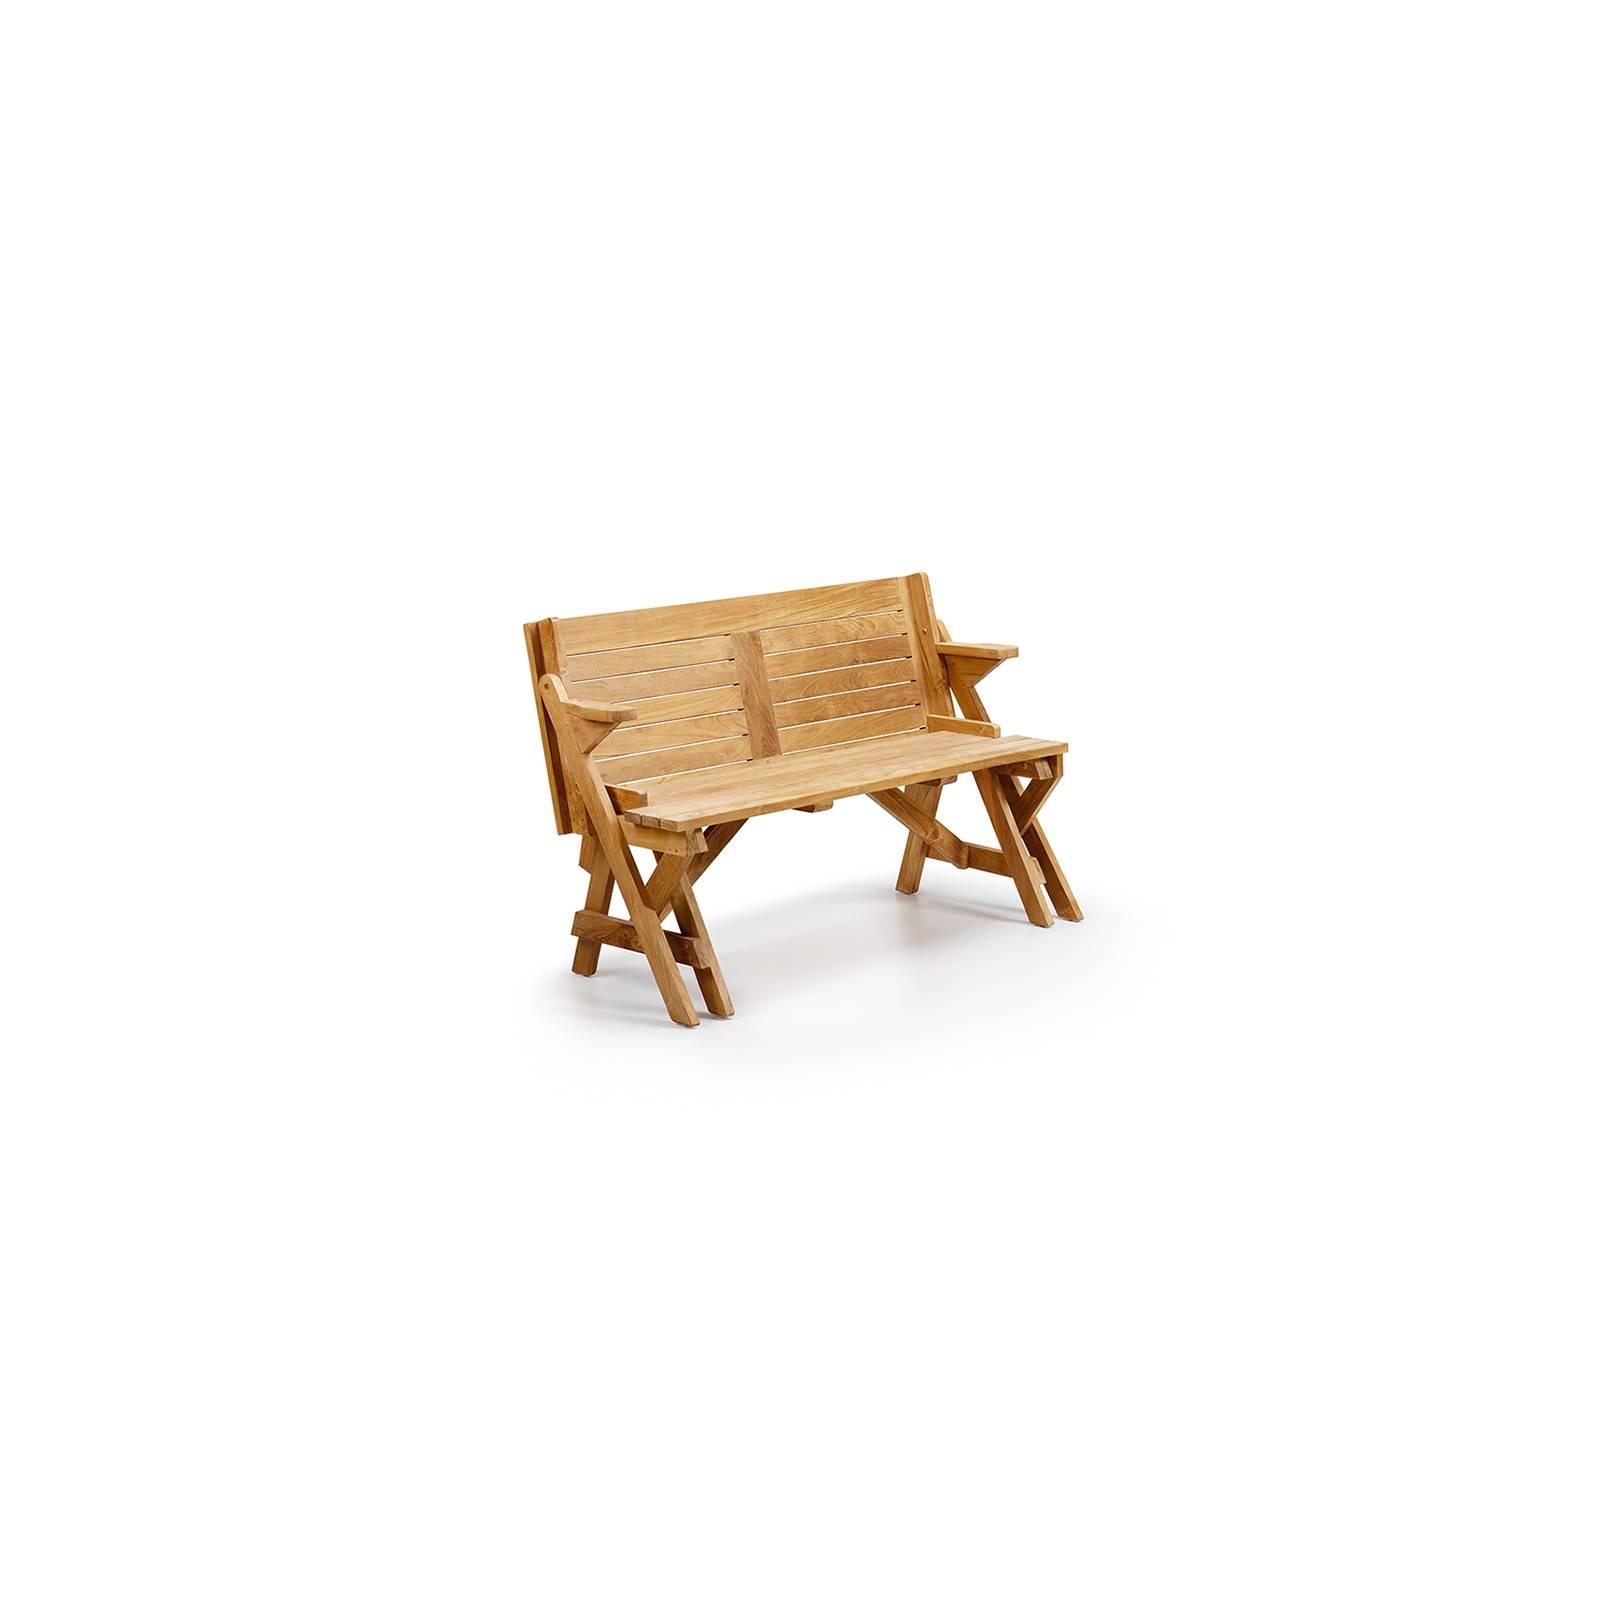 Banc de jardin convertible en table Greenwood Teck